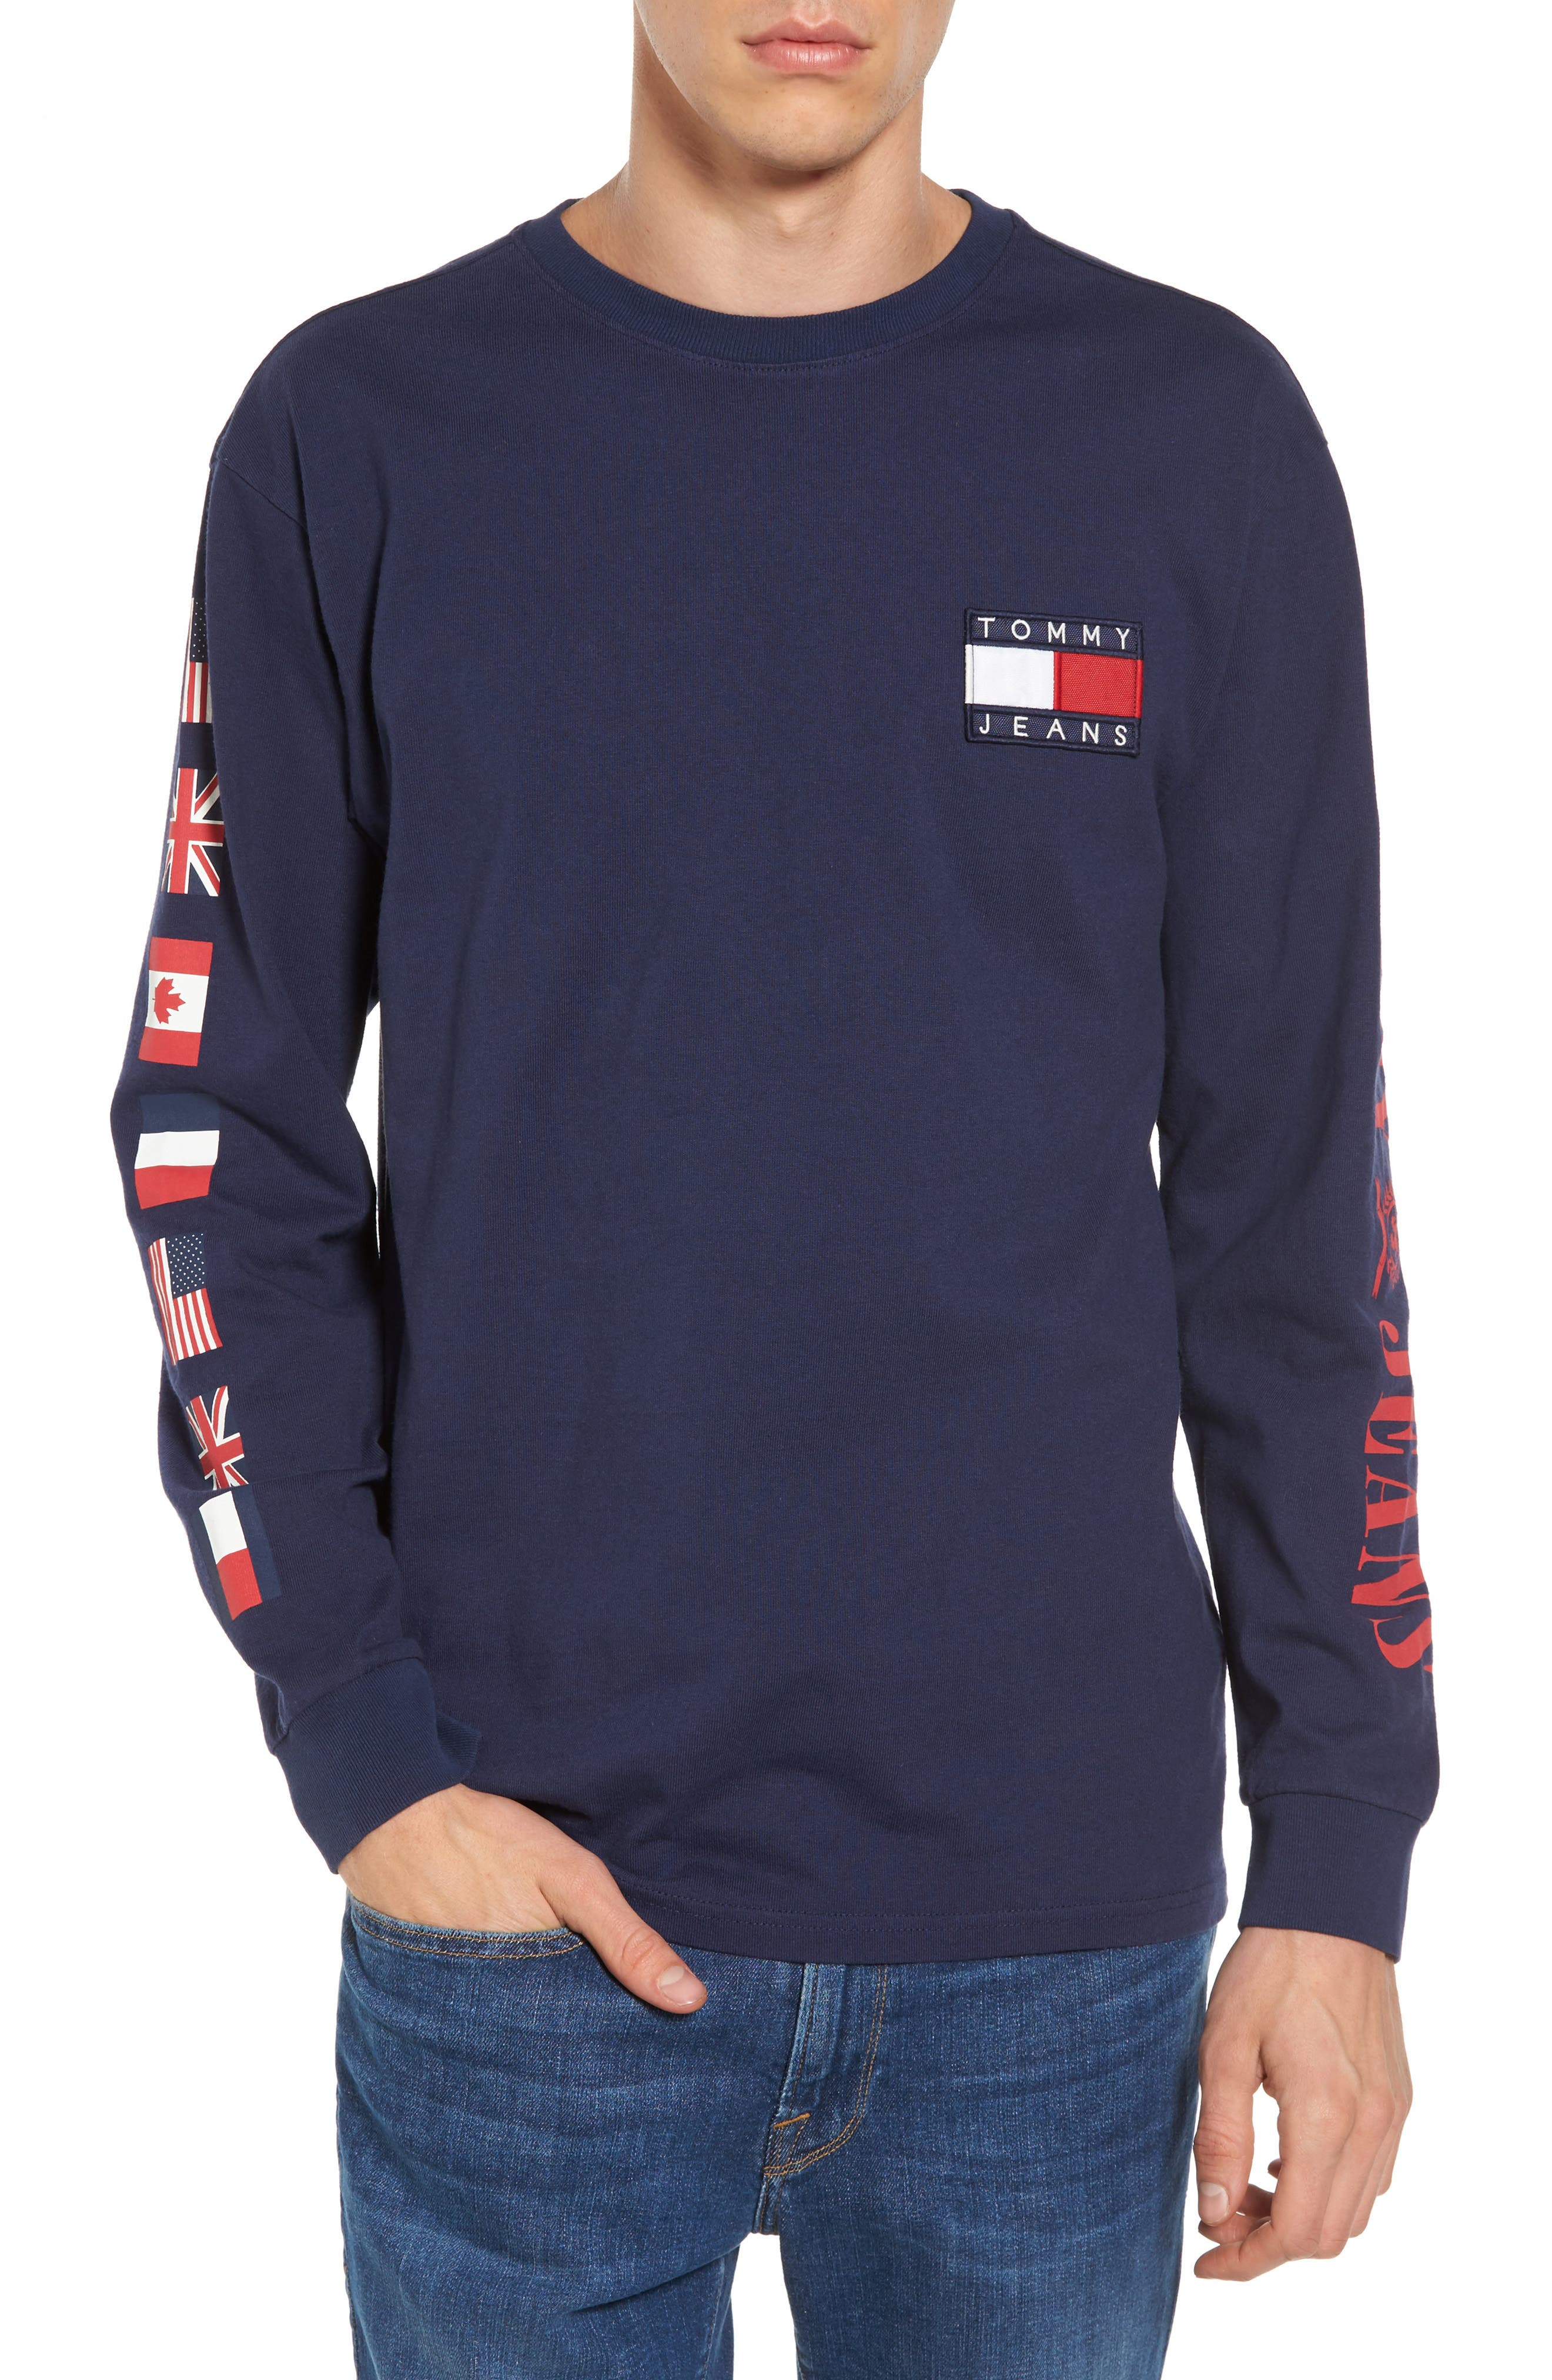 Tommy Hilfiger 90s Long Sleeve T-Shirt